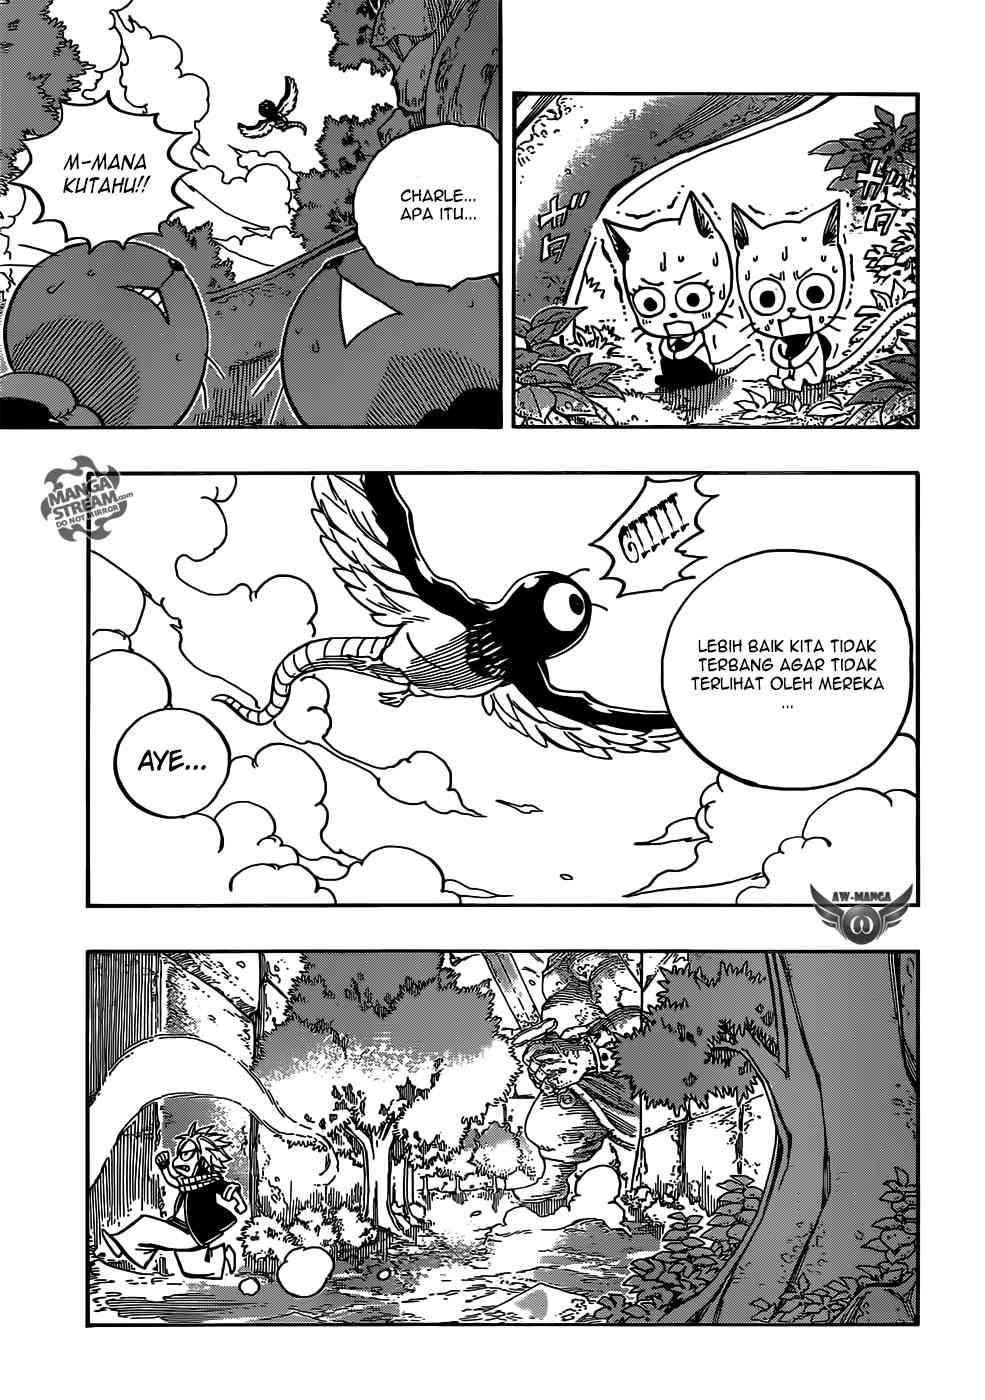 Dilarang COPAS - situs resmi www.mangacanblog.com - Komik fairy tail 348 - kemunculan iblis 349 Indonesia fairy tail 348 - kemunculan iblis Terbaru 6|Baca Manga Komik Indonesia|Mangacan